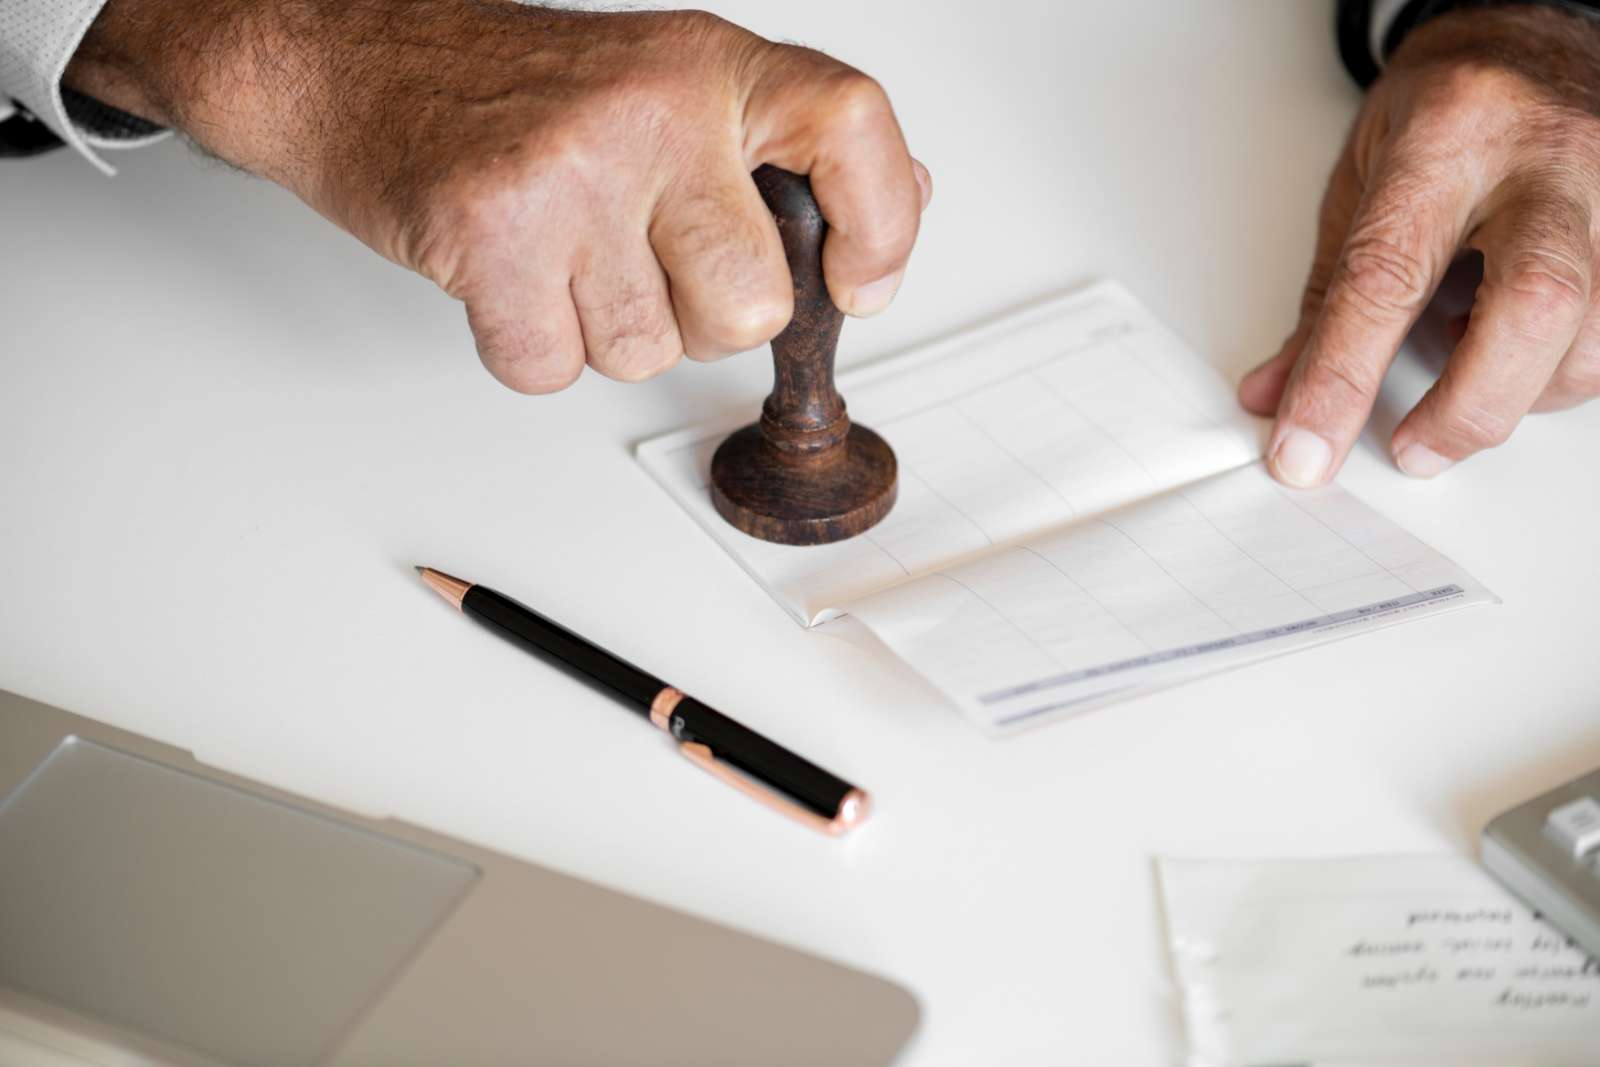 document retention and digitization